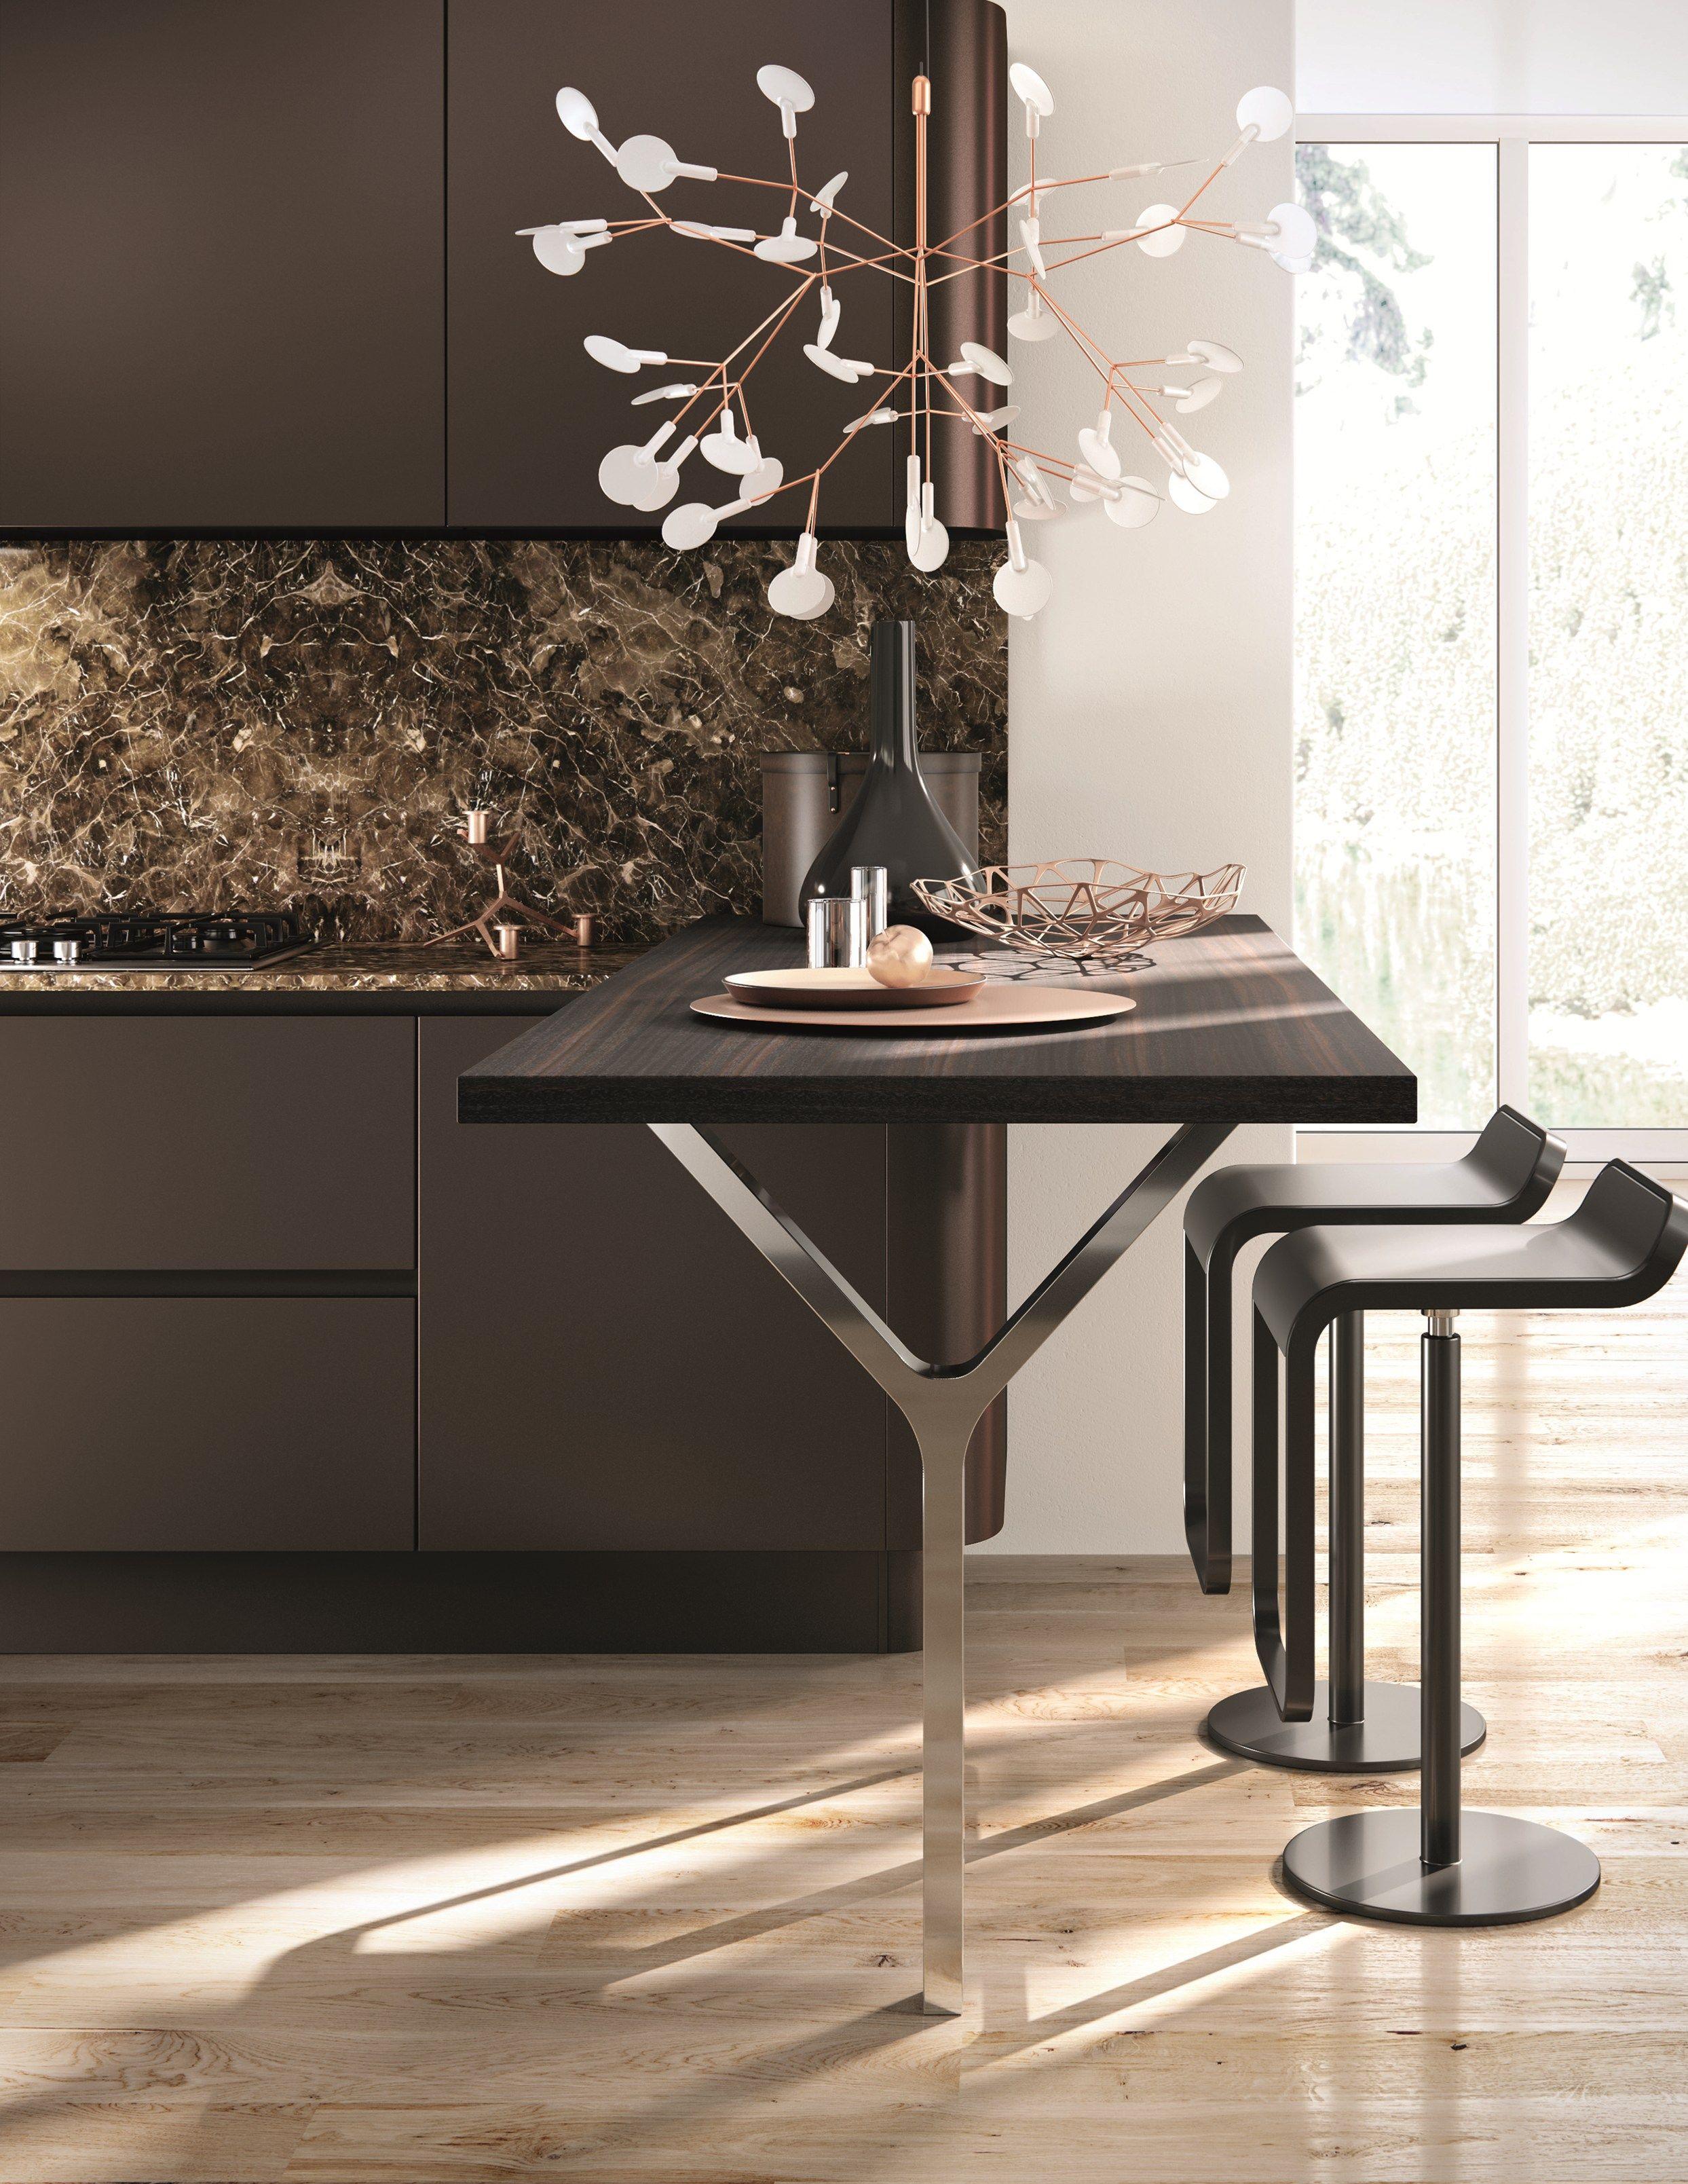 DOMINA Cocina Lineal By Aster Cucine Diseño Lorenzo Granocchia. Kitchen  ModernContemporary ...